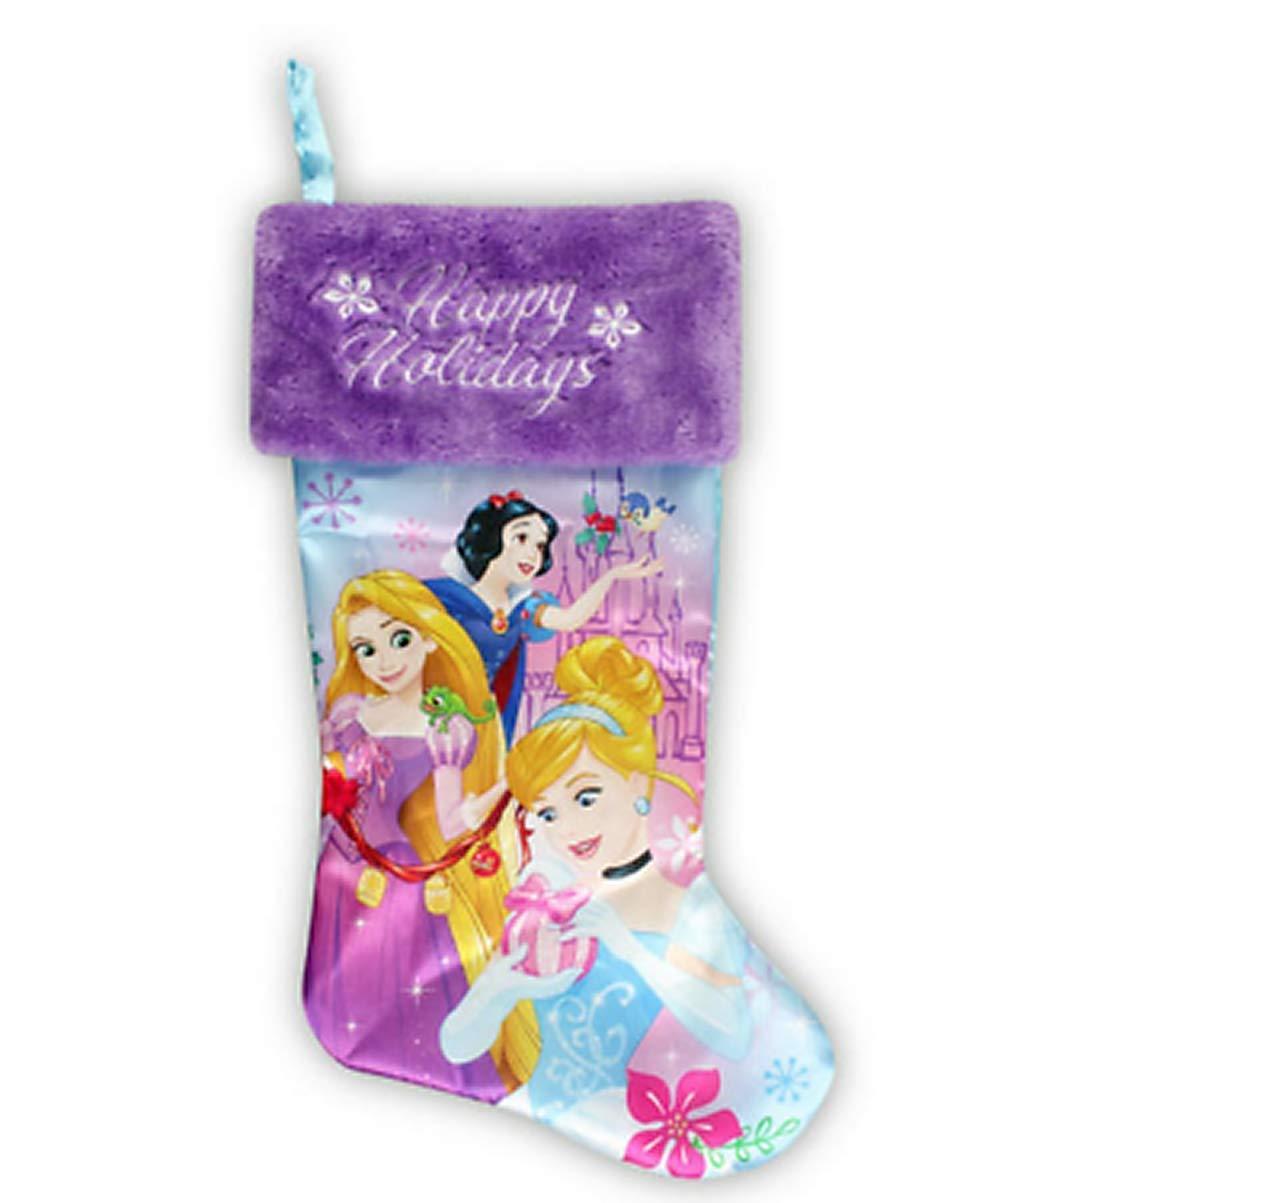 Disney Princess Happy Holidays Christmas Stocking 18